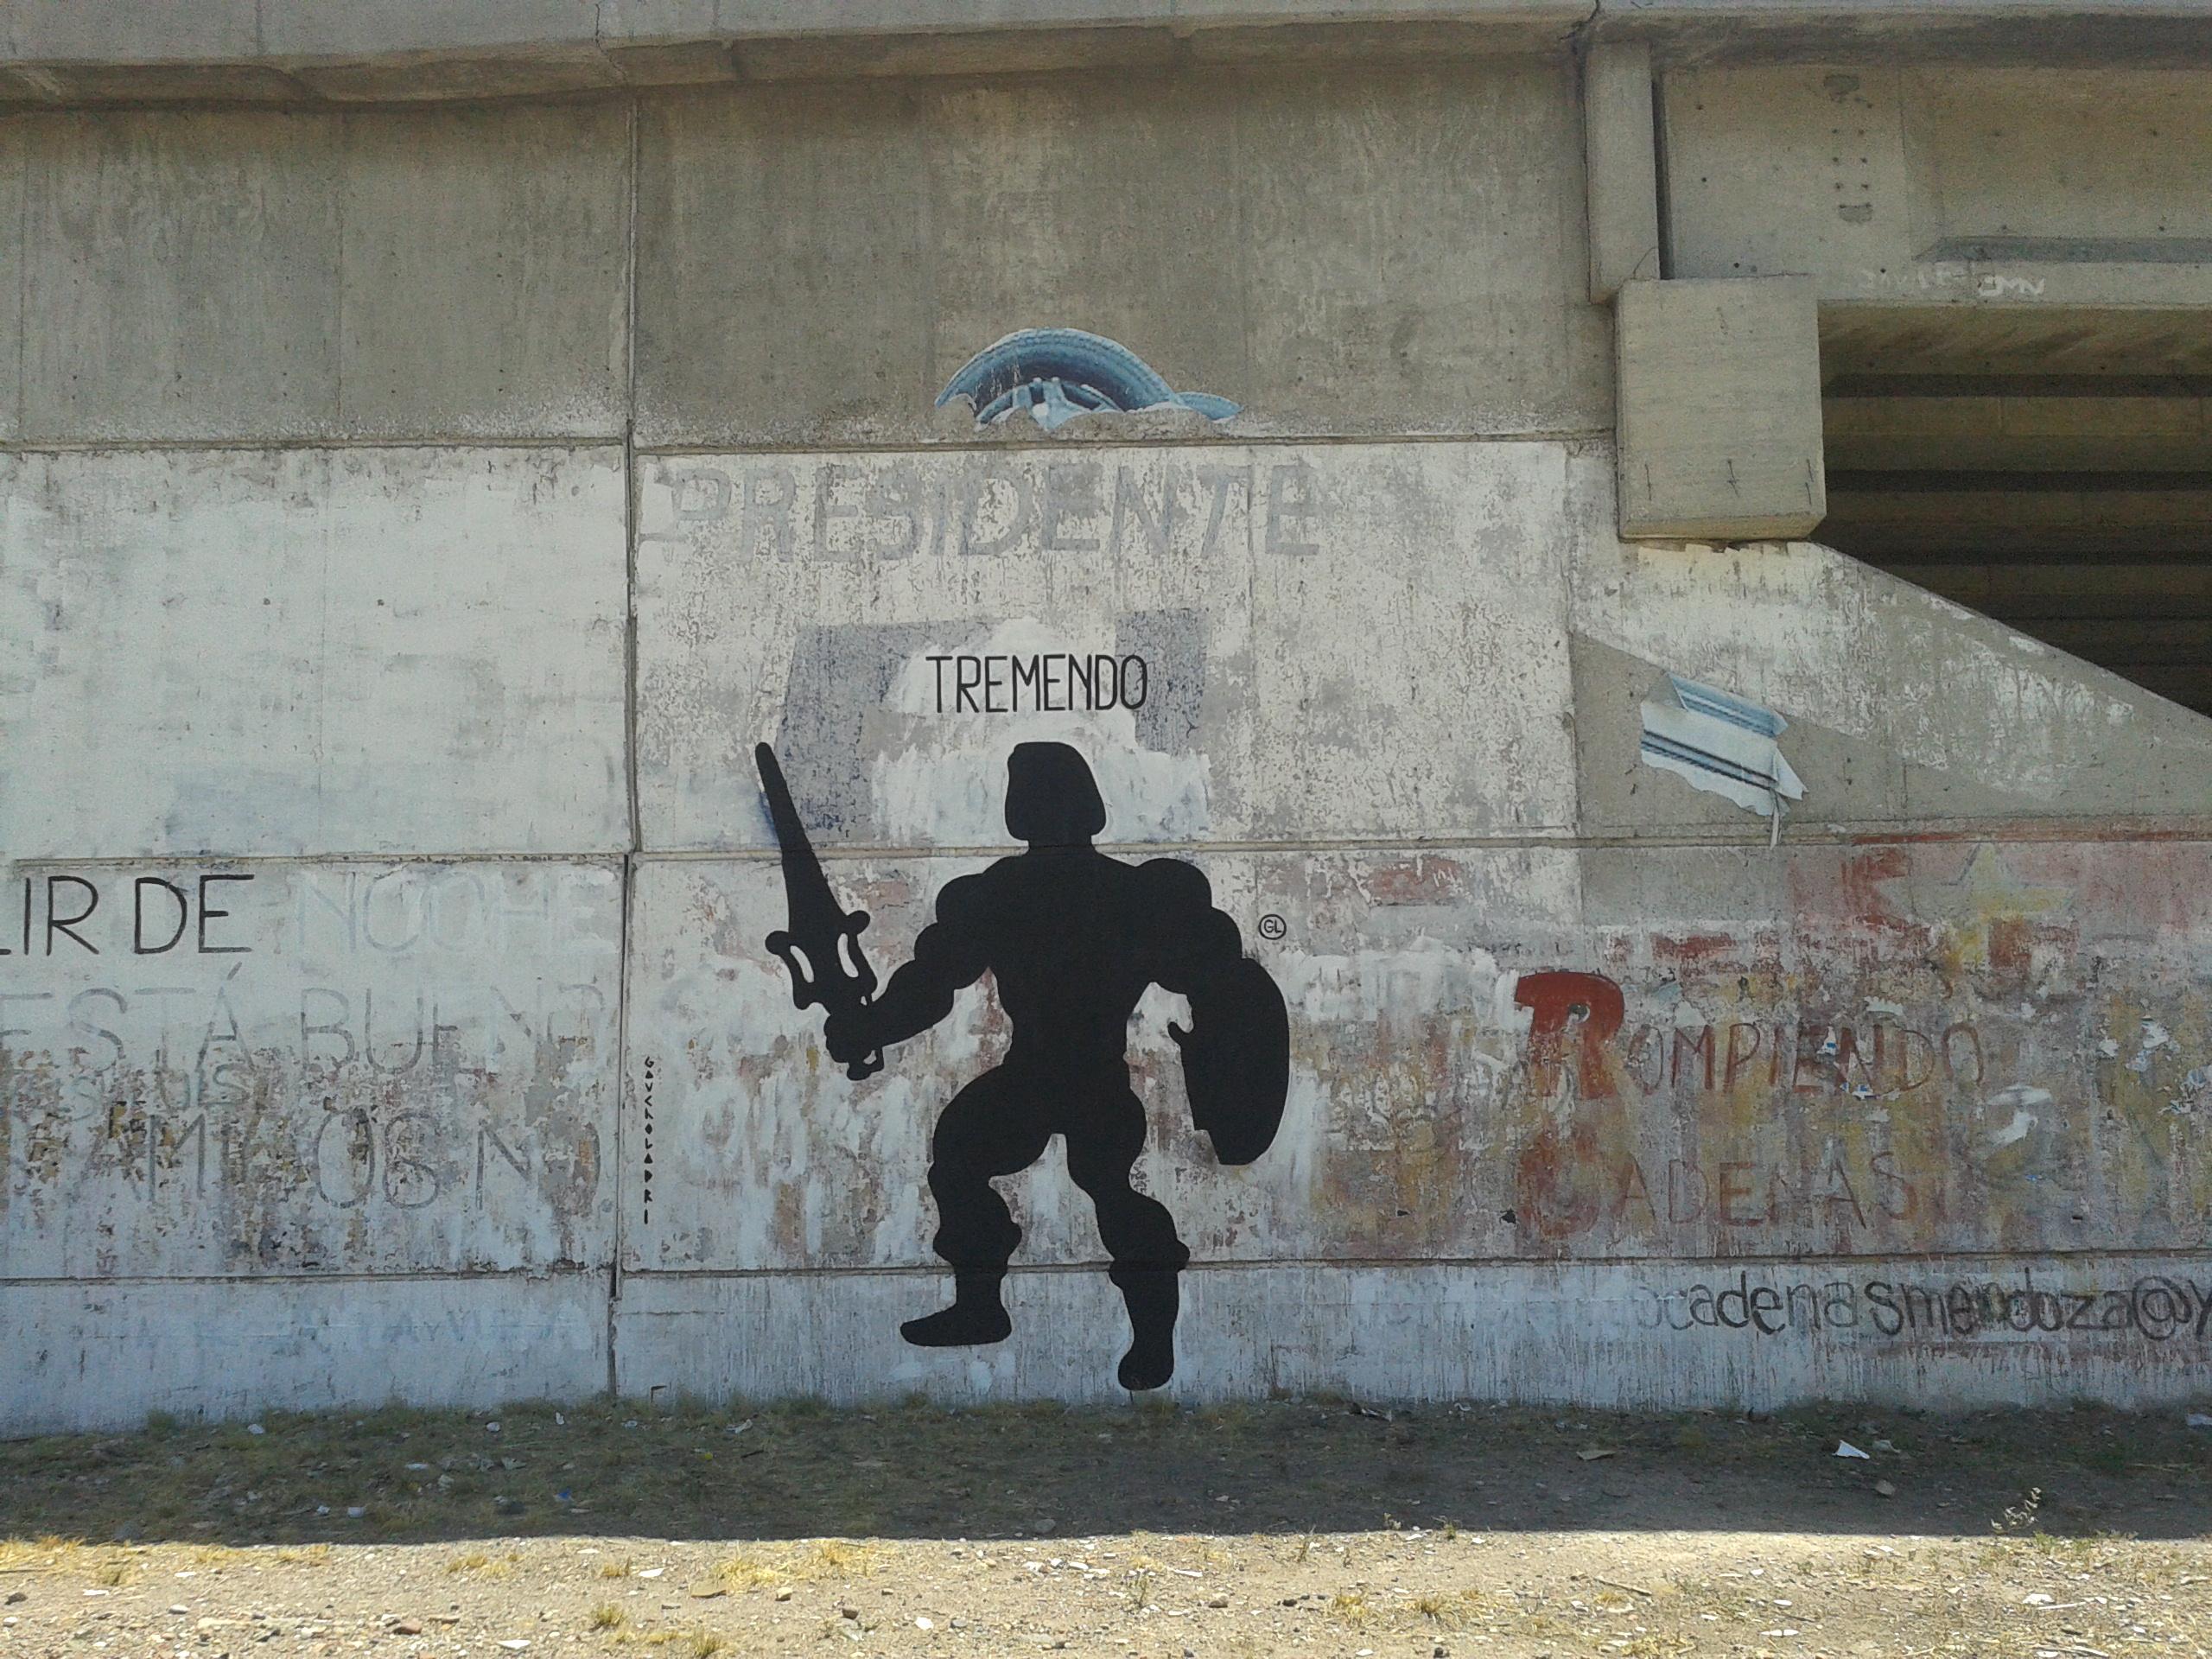 gaucholadri-tremendo-a-new-mural-in-mendoza-argentina-08